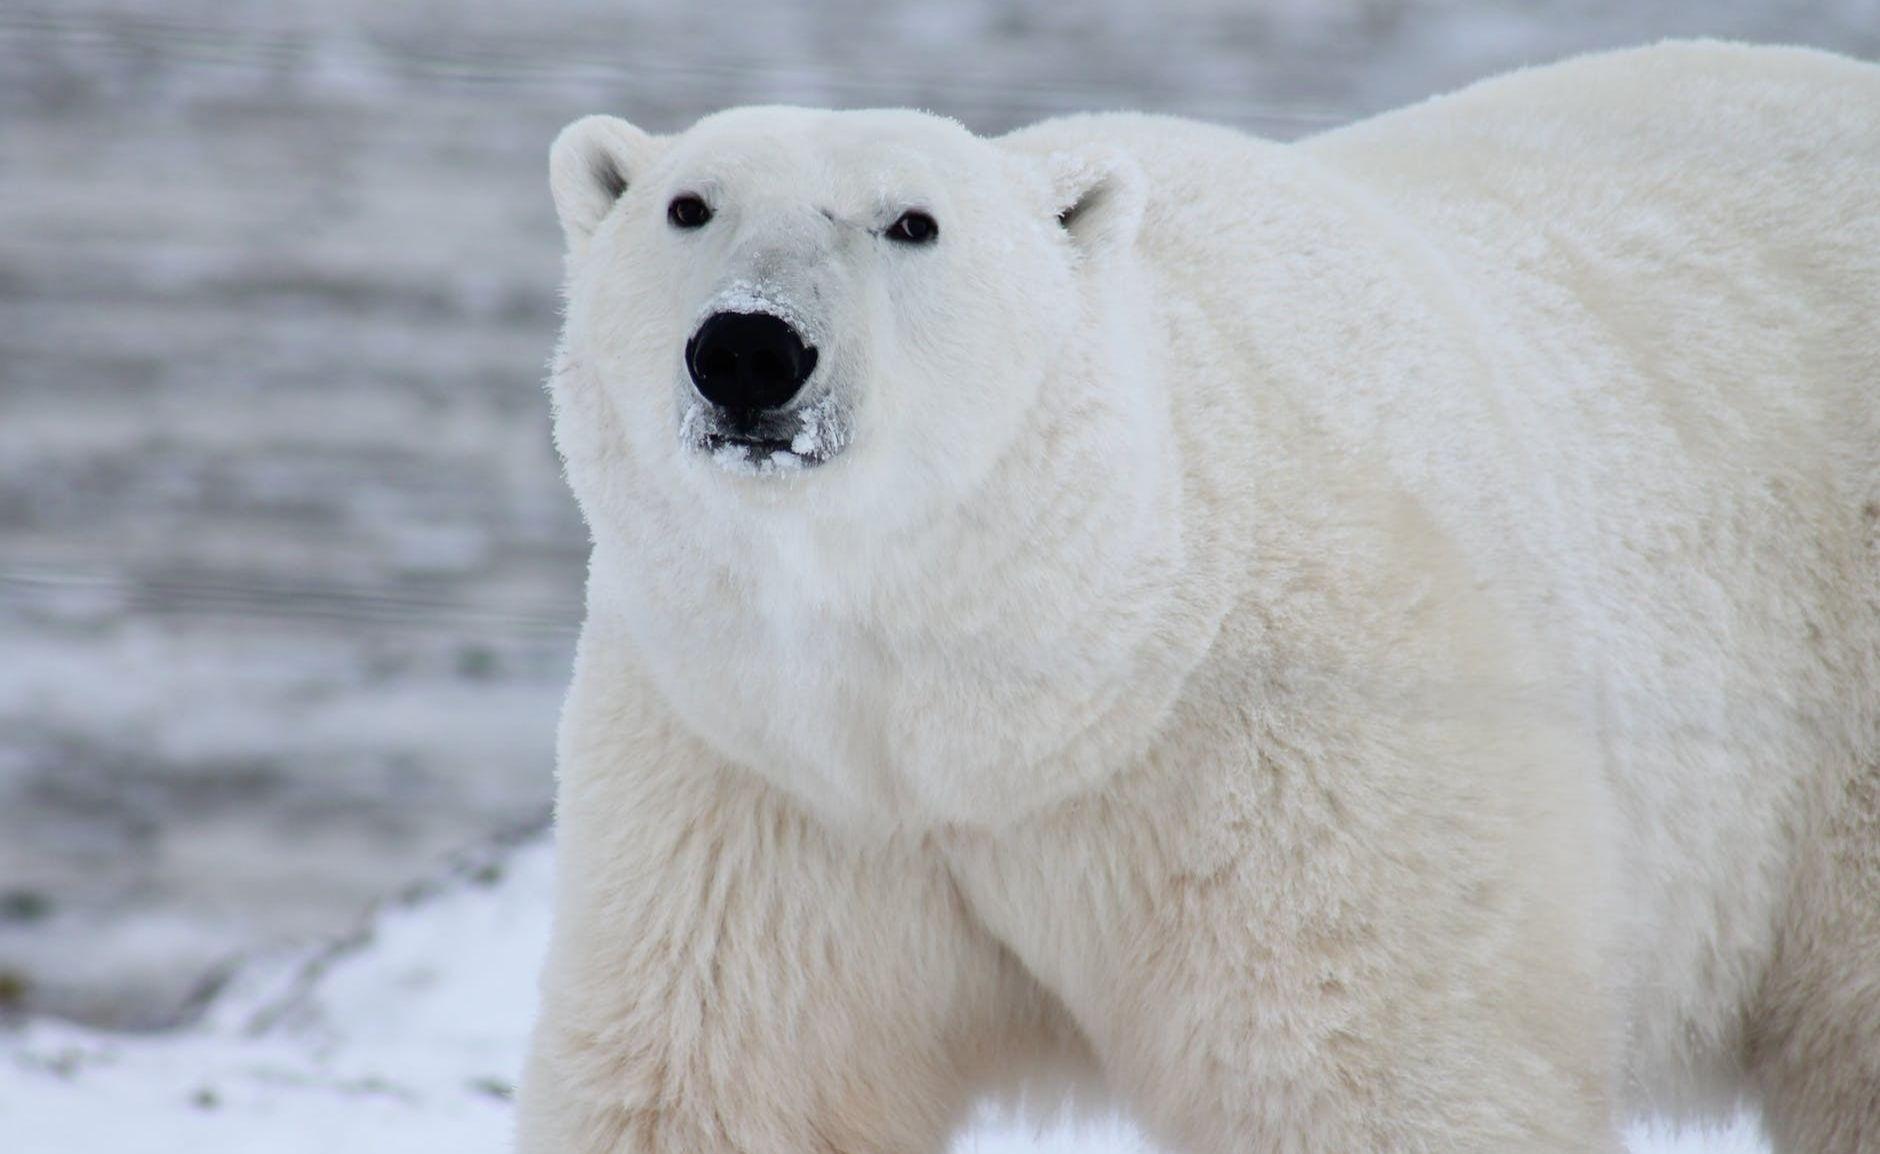 Polar bear arctic wildlife snow 53425